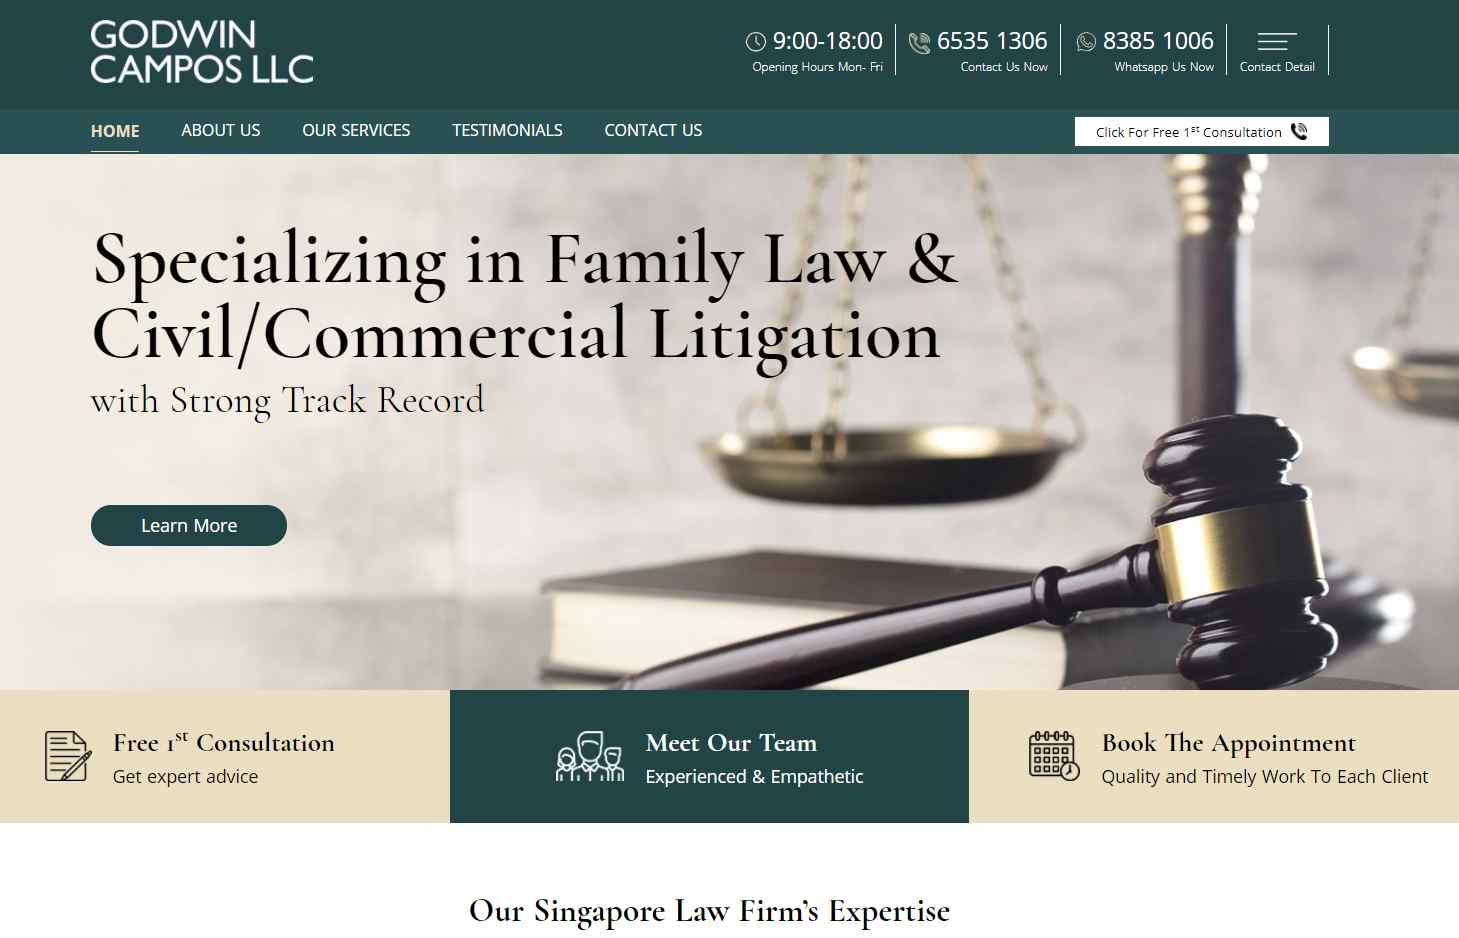 godwin campos Top Divorce Lawyers in Singapore